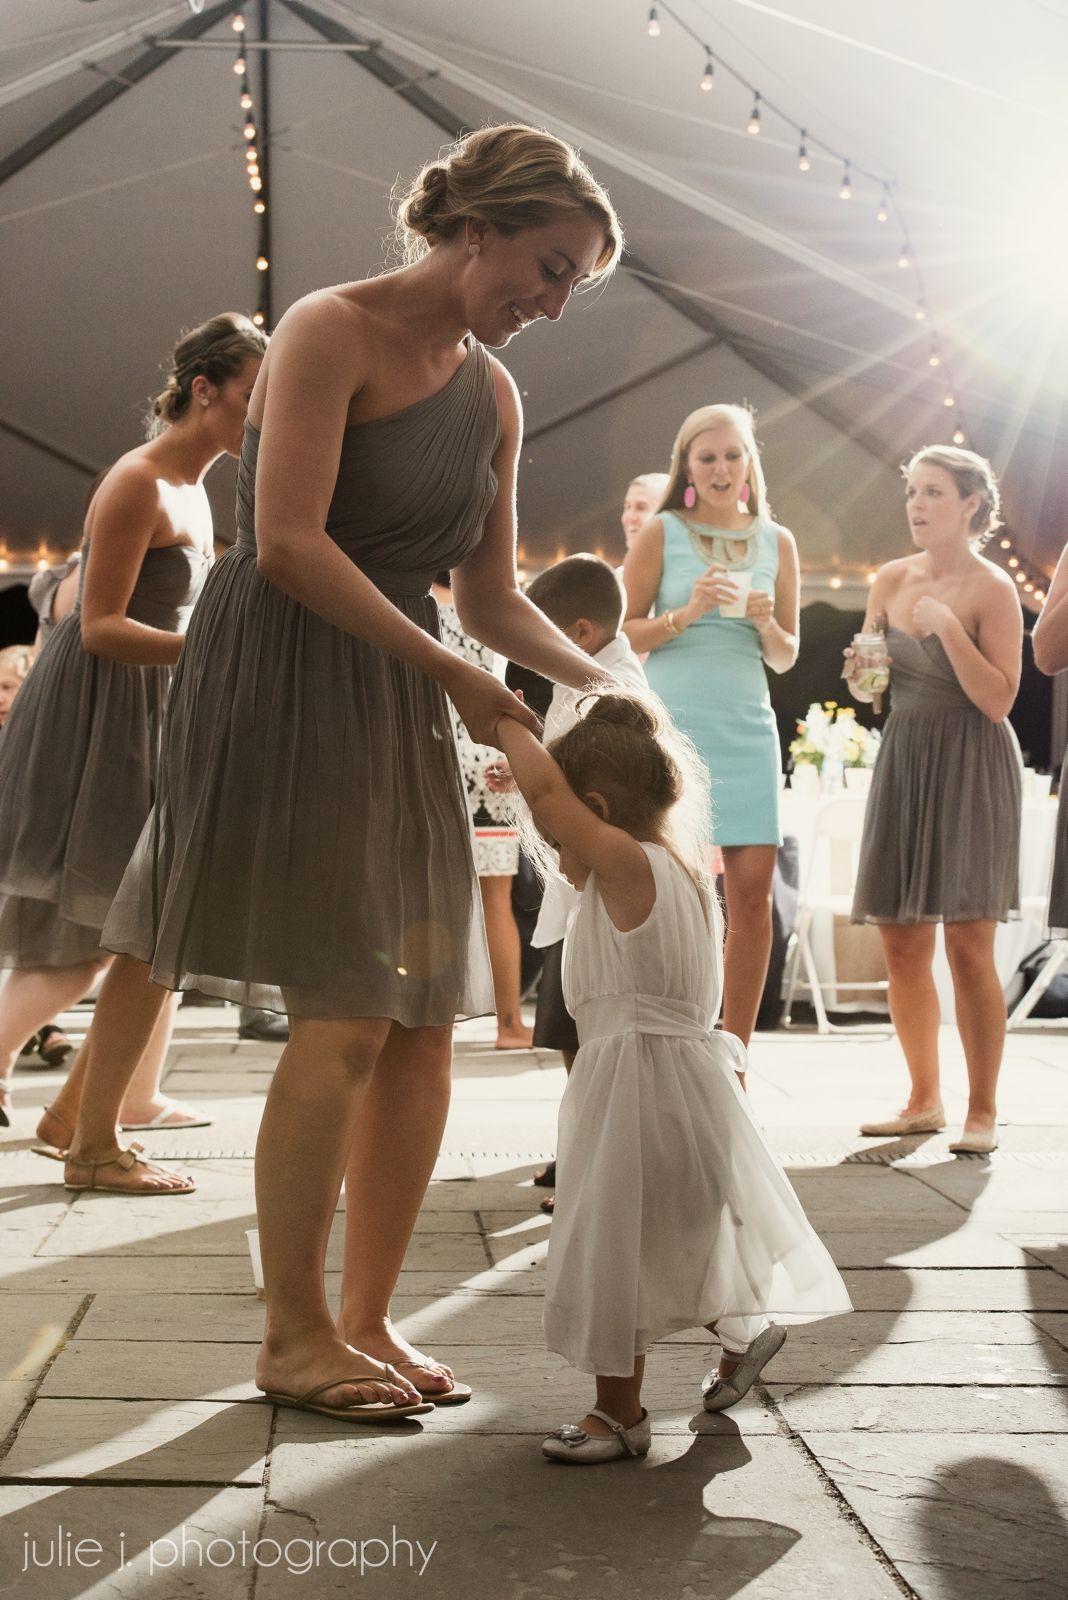 Wedding dresses richmond va  Bridesmaid and flower girl dress ideas Tredegar Iron Works wedding